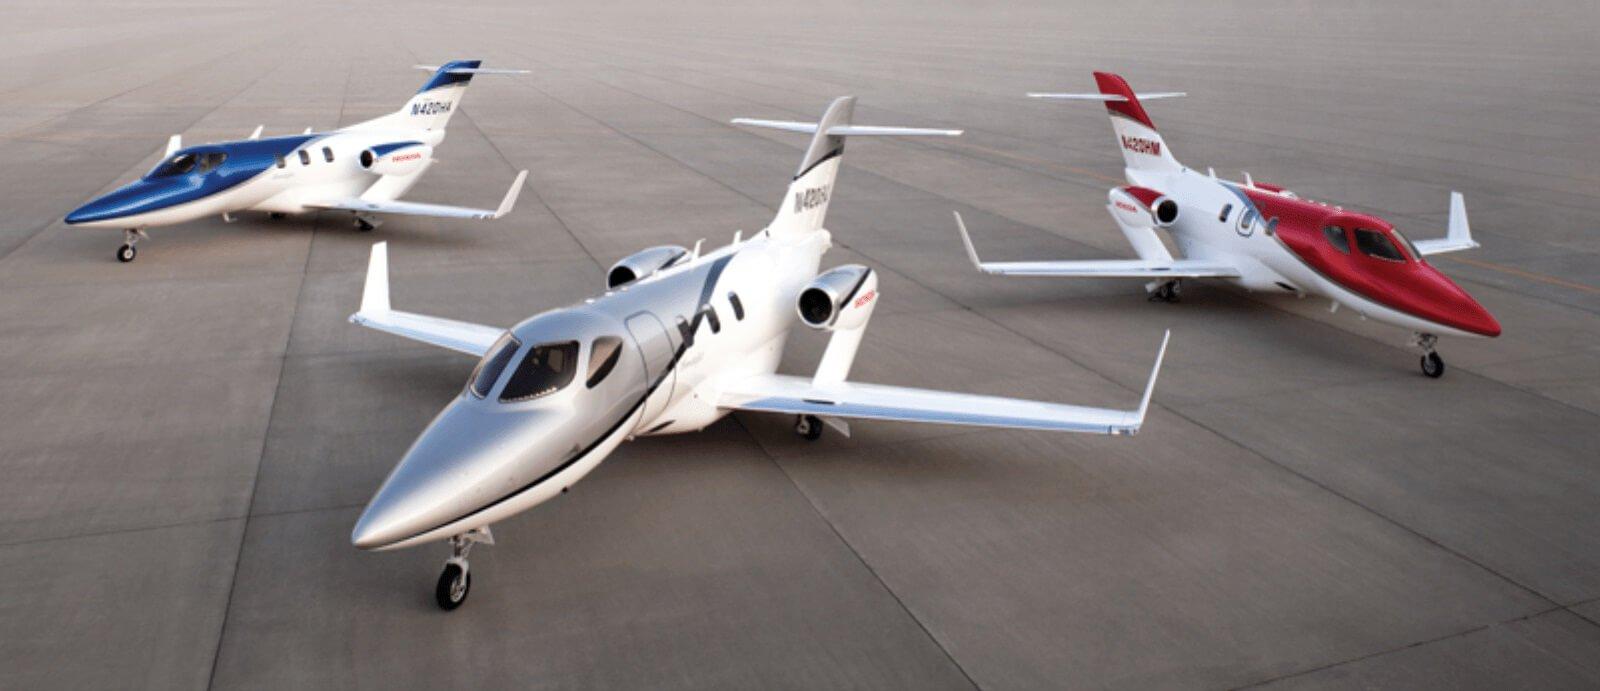 Hawaiian Wing Spirit charter purchases 15 HondaJets